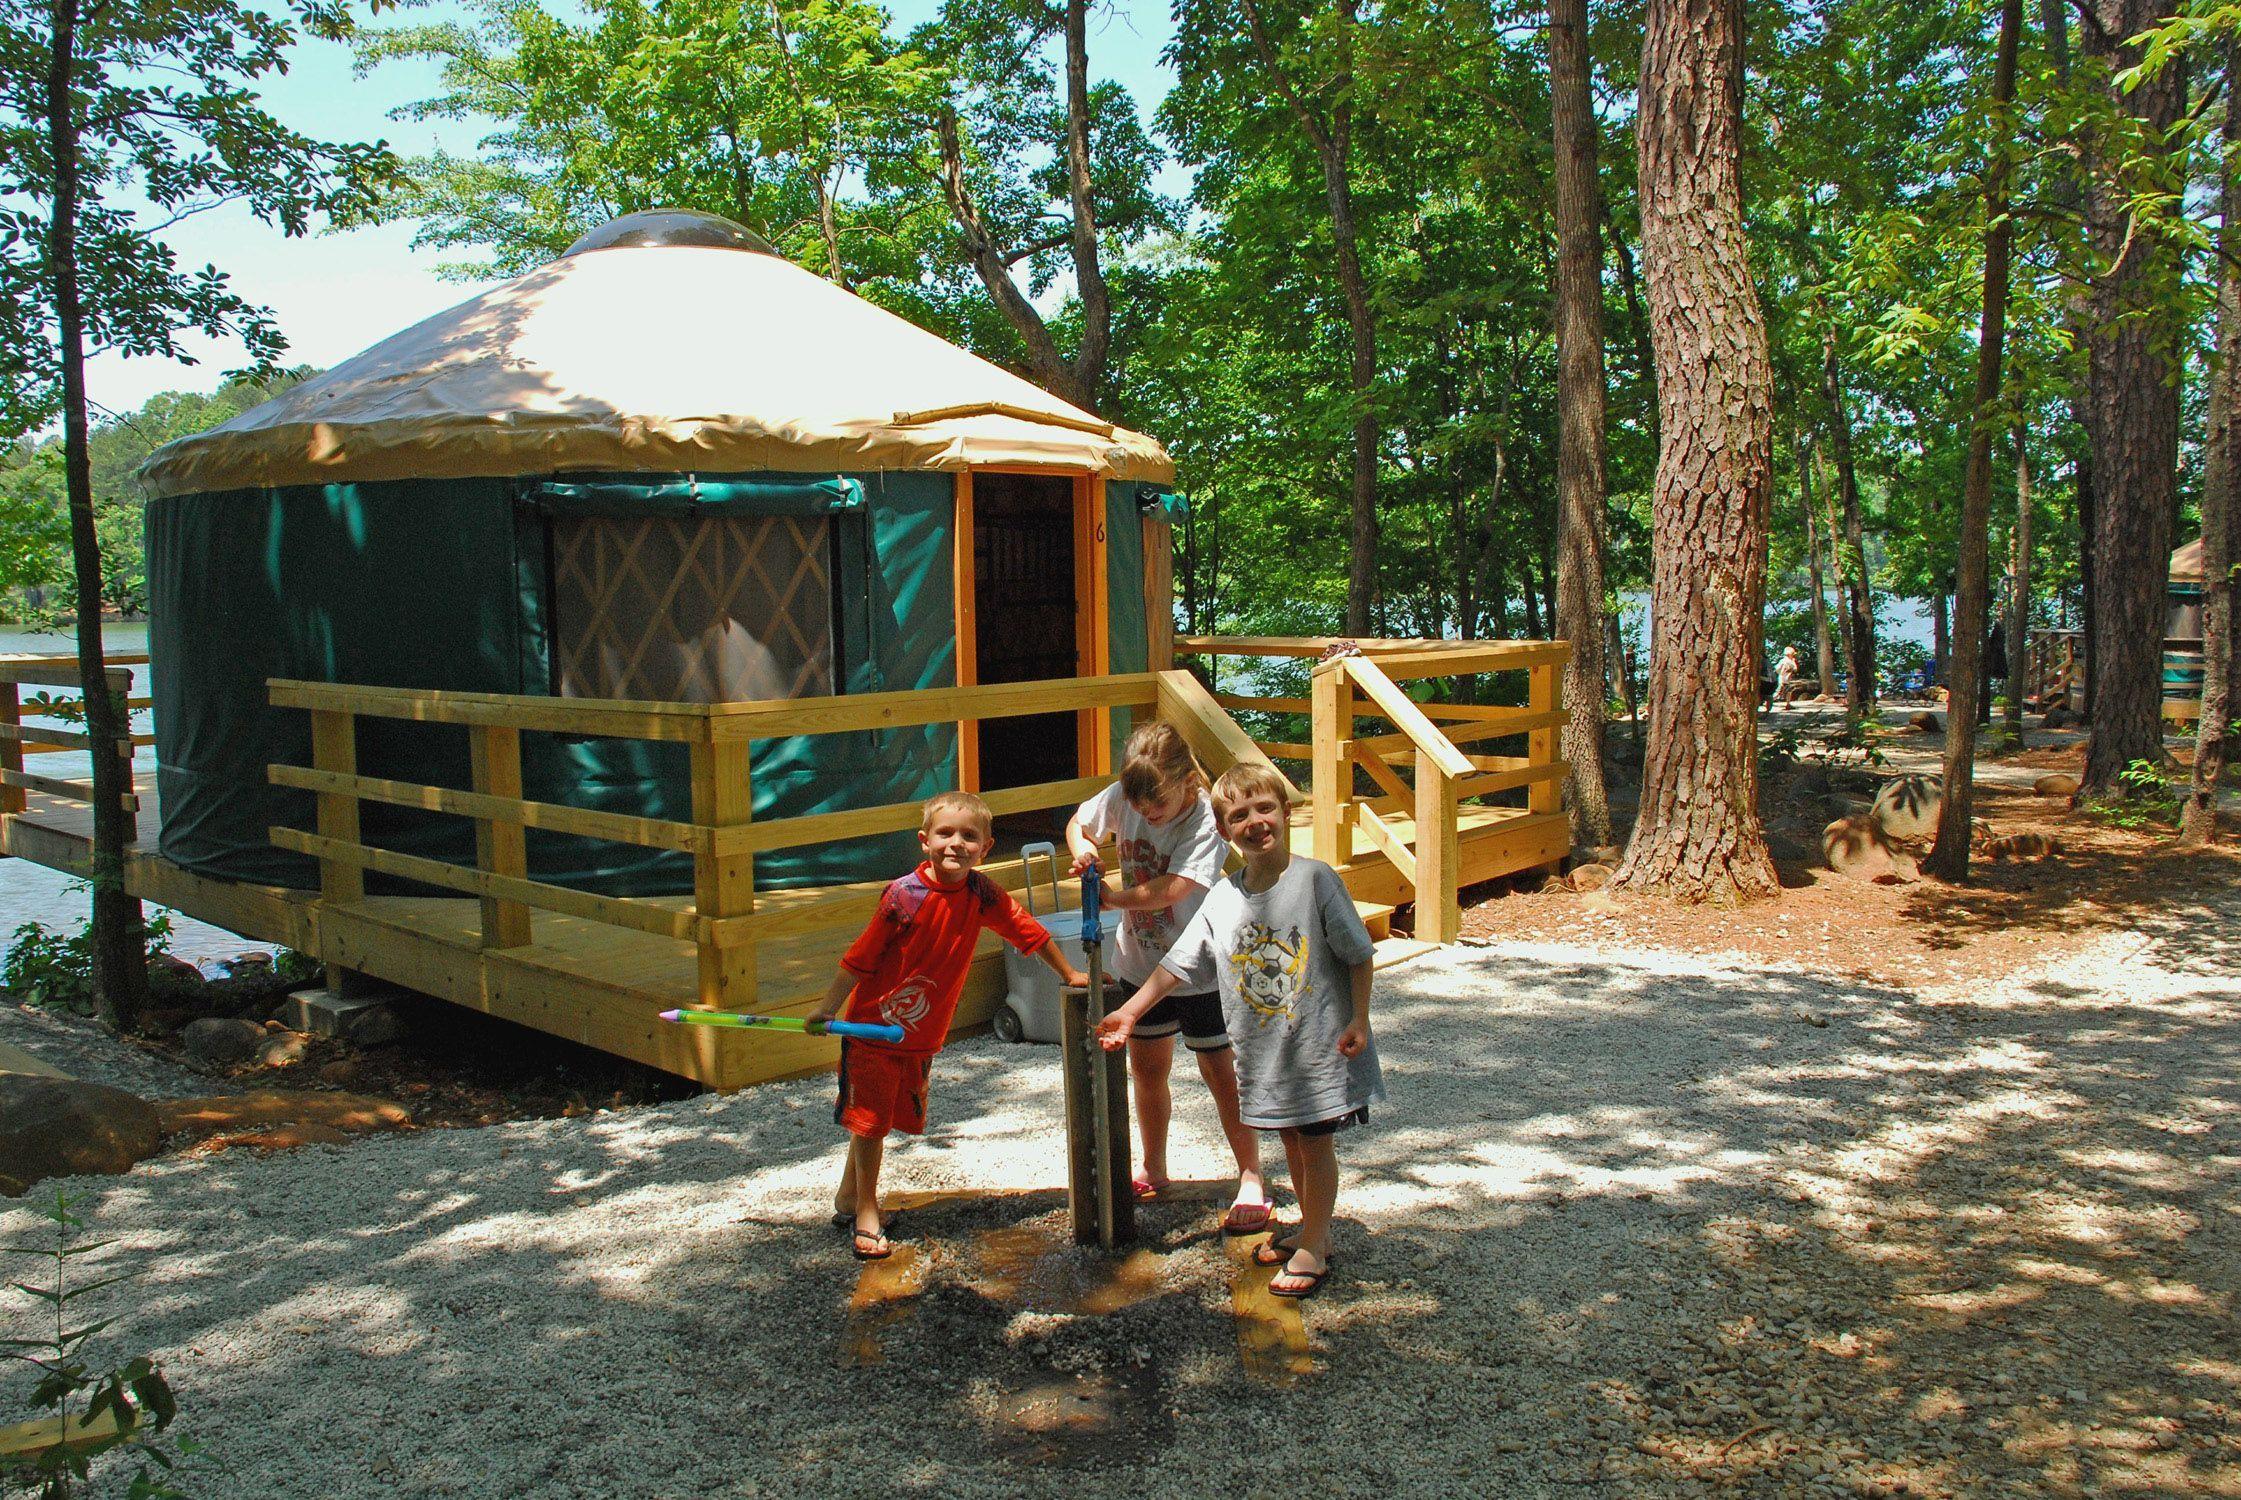 Fort Yargo State Park Winder GA 30680 Yurt Interior